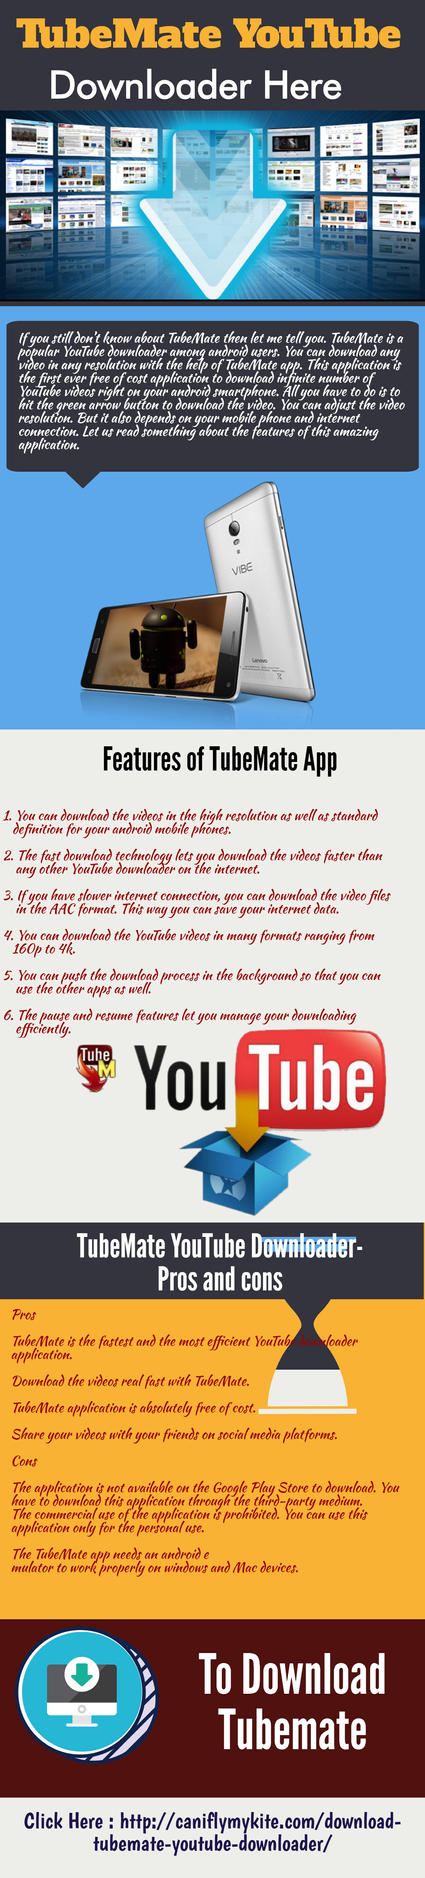 Youtube Downloader By Davidmclaughlin Step 4: Change Download Folder For  Tubemate Once You Understand How